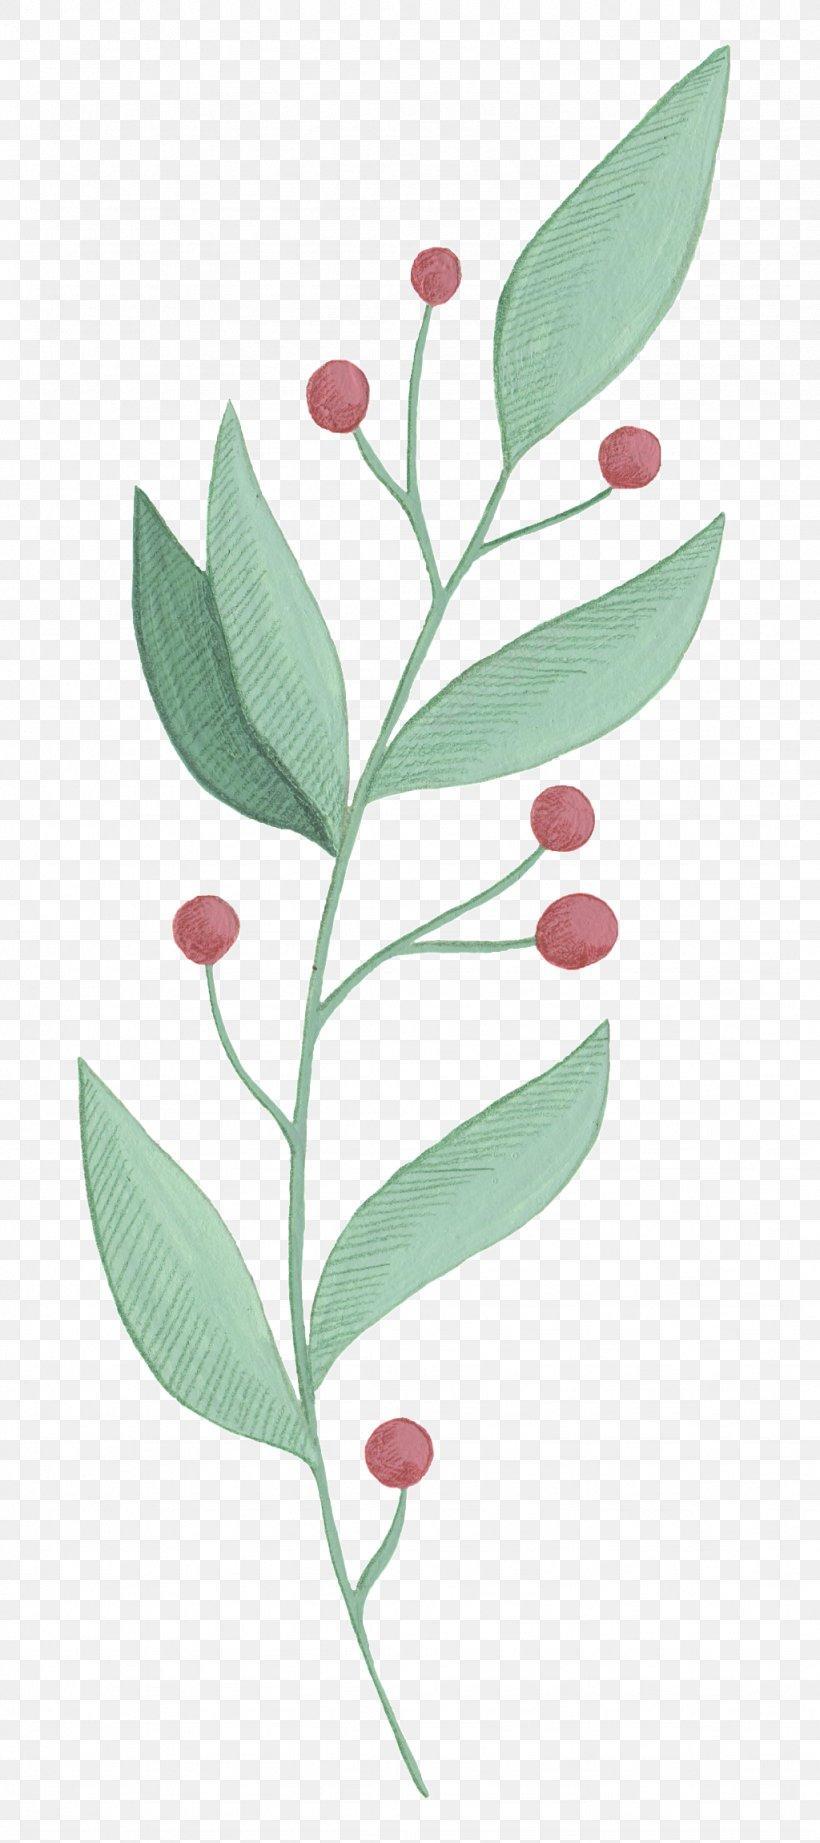 Plant Flower Leaf Tree Woody Plant, PNG, 1024x2302px, Plant, Branch, Flower, Leaf, Plant Stem Download Free